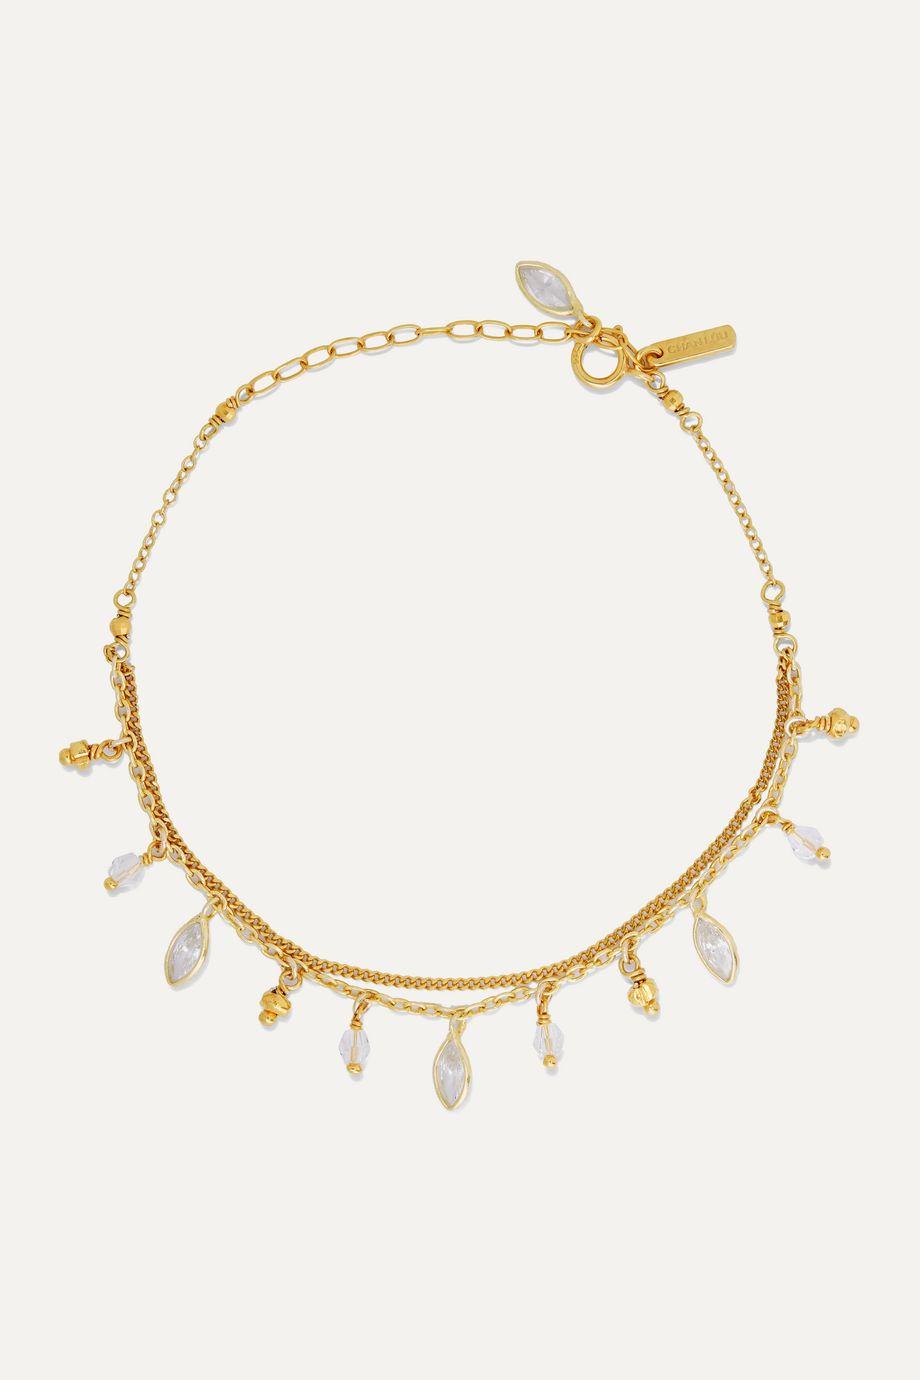 Chan Luu Gold-plated Swarovski crystal bracelet